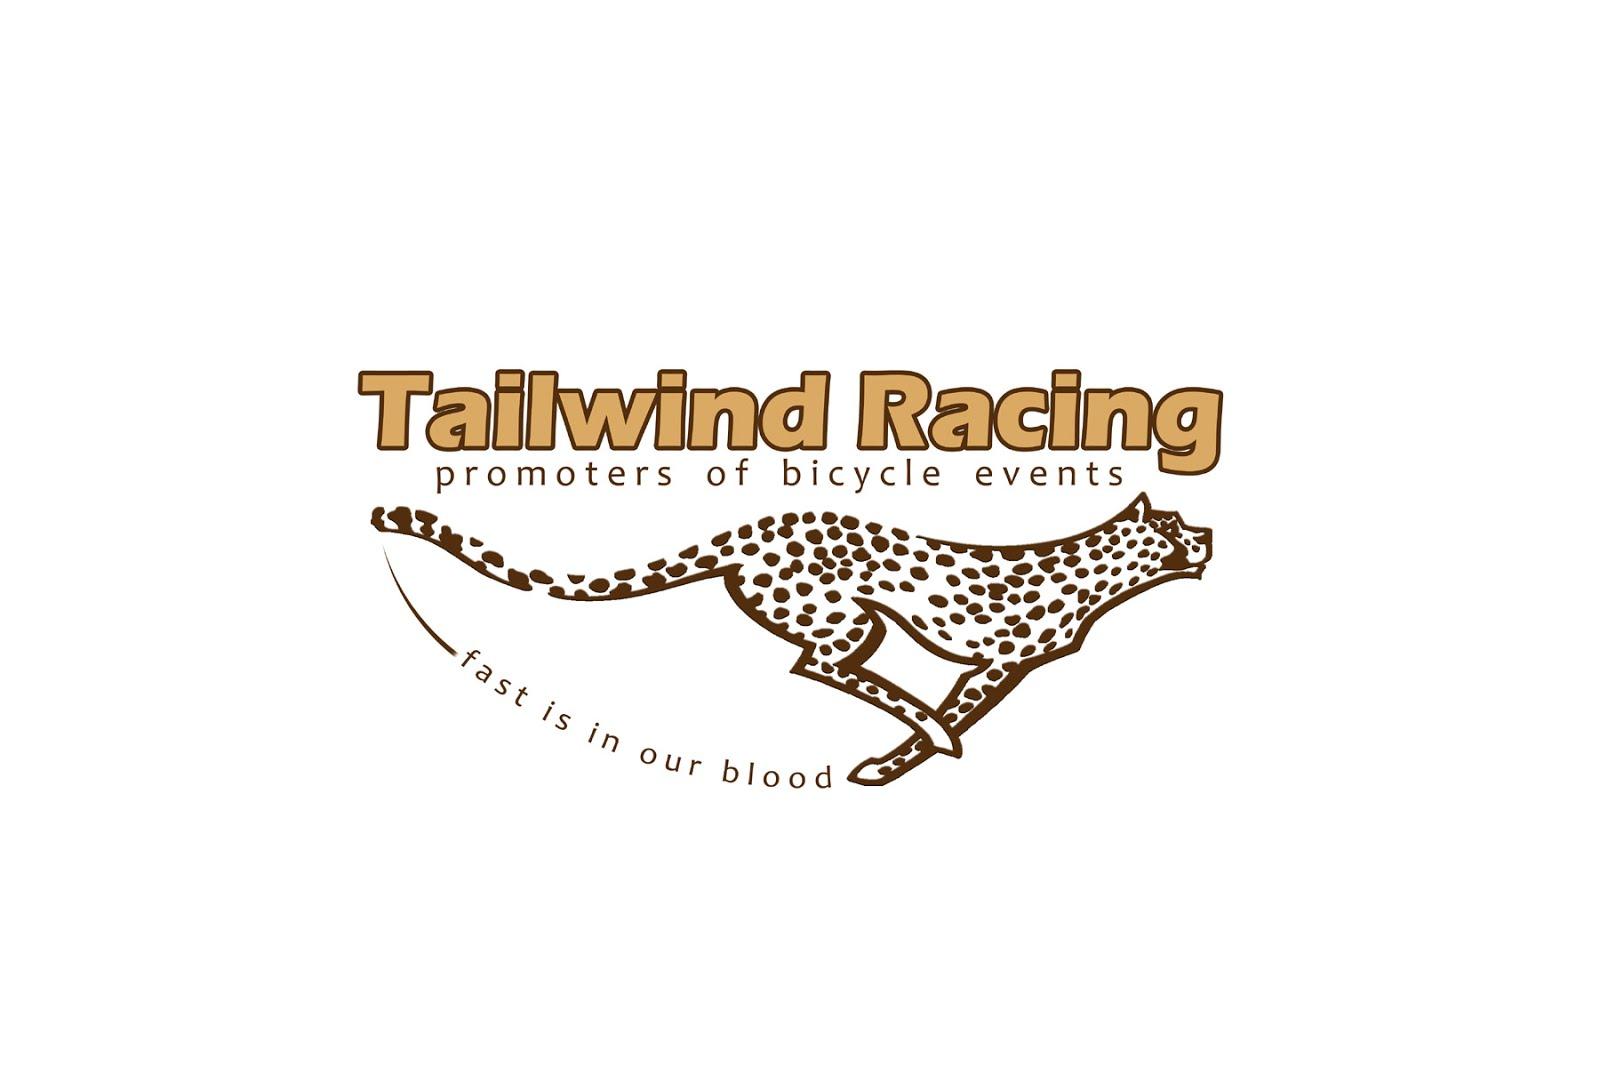 Tailwind Racing